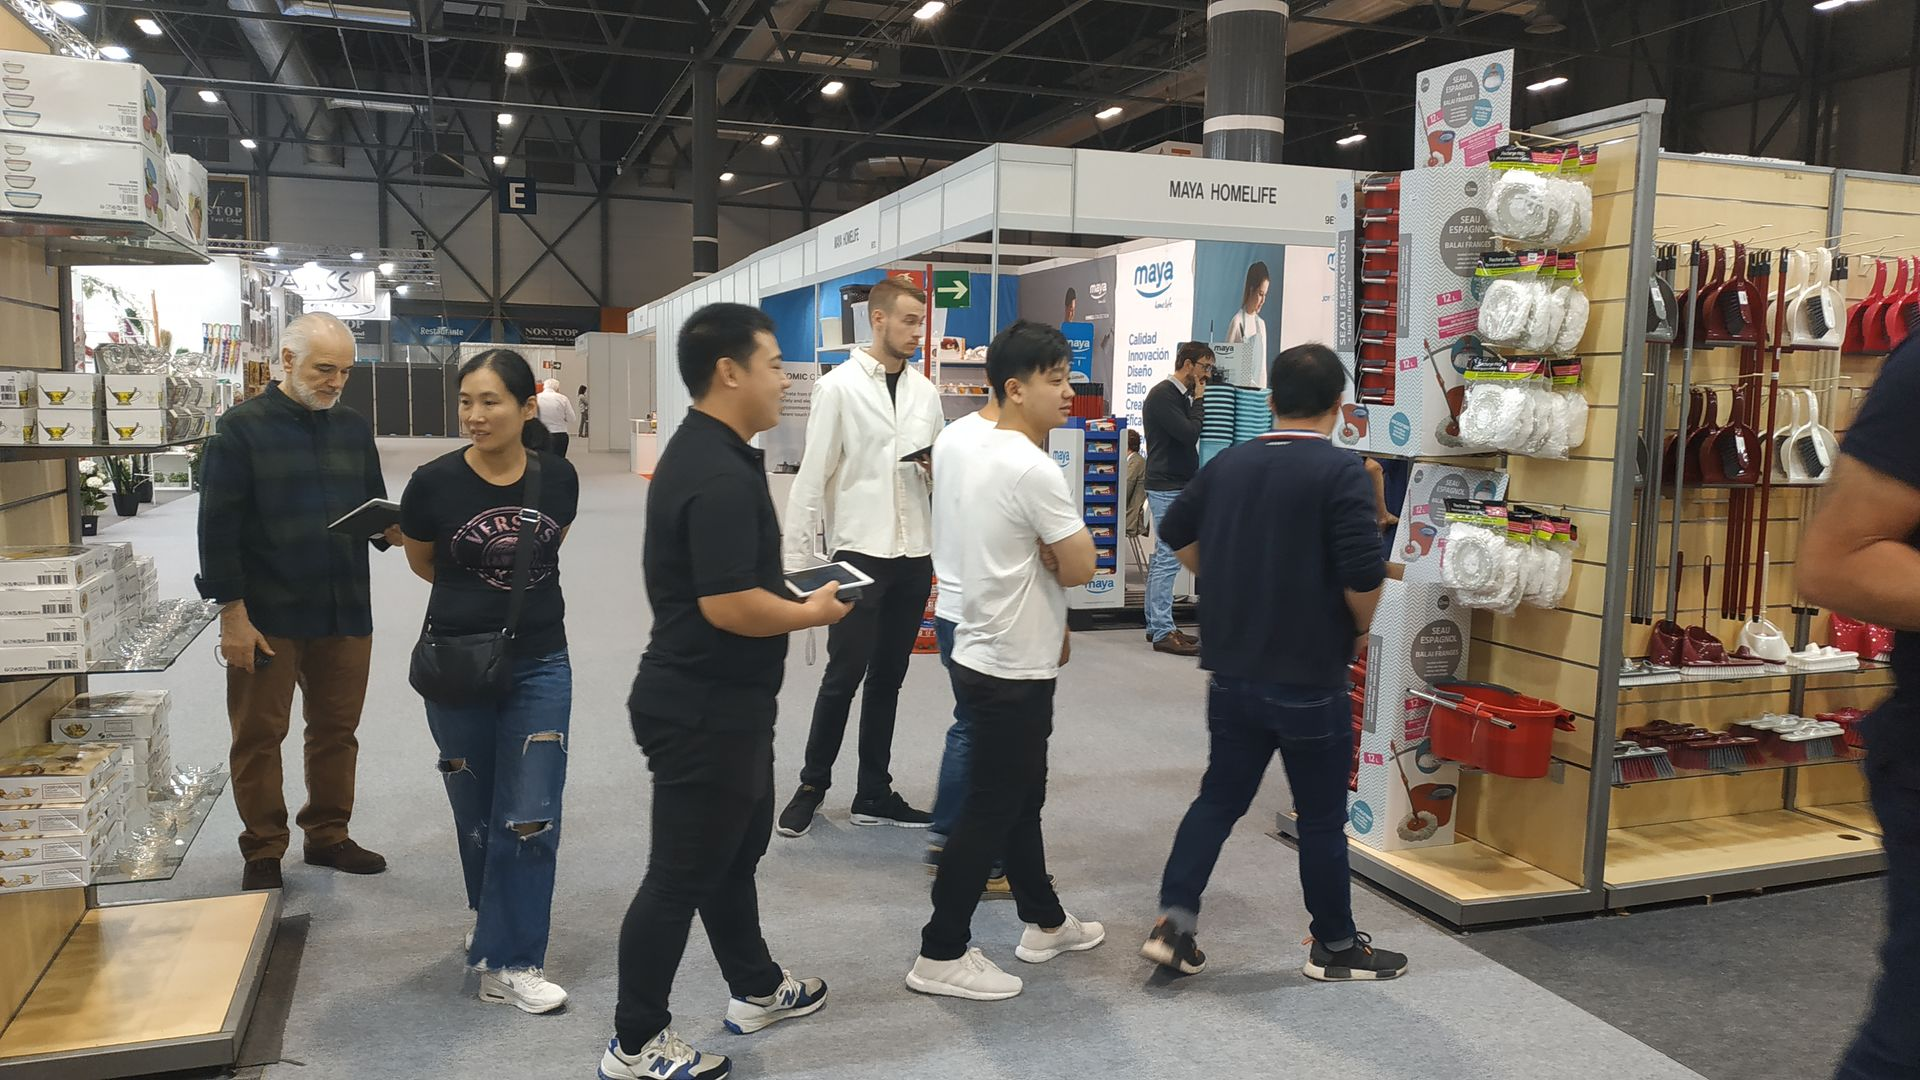 chinos-compran.jpg